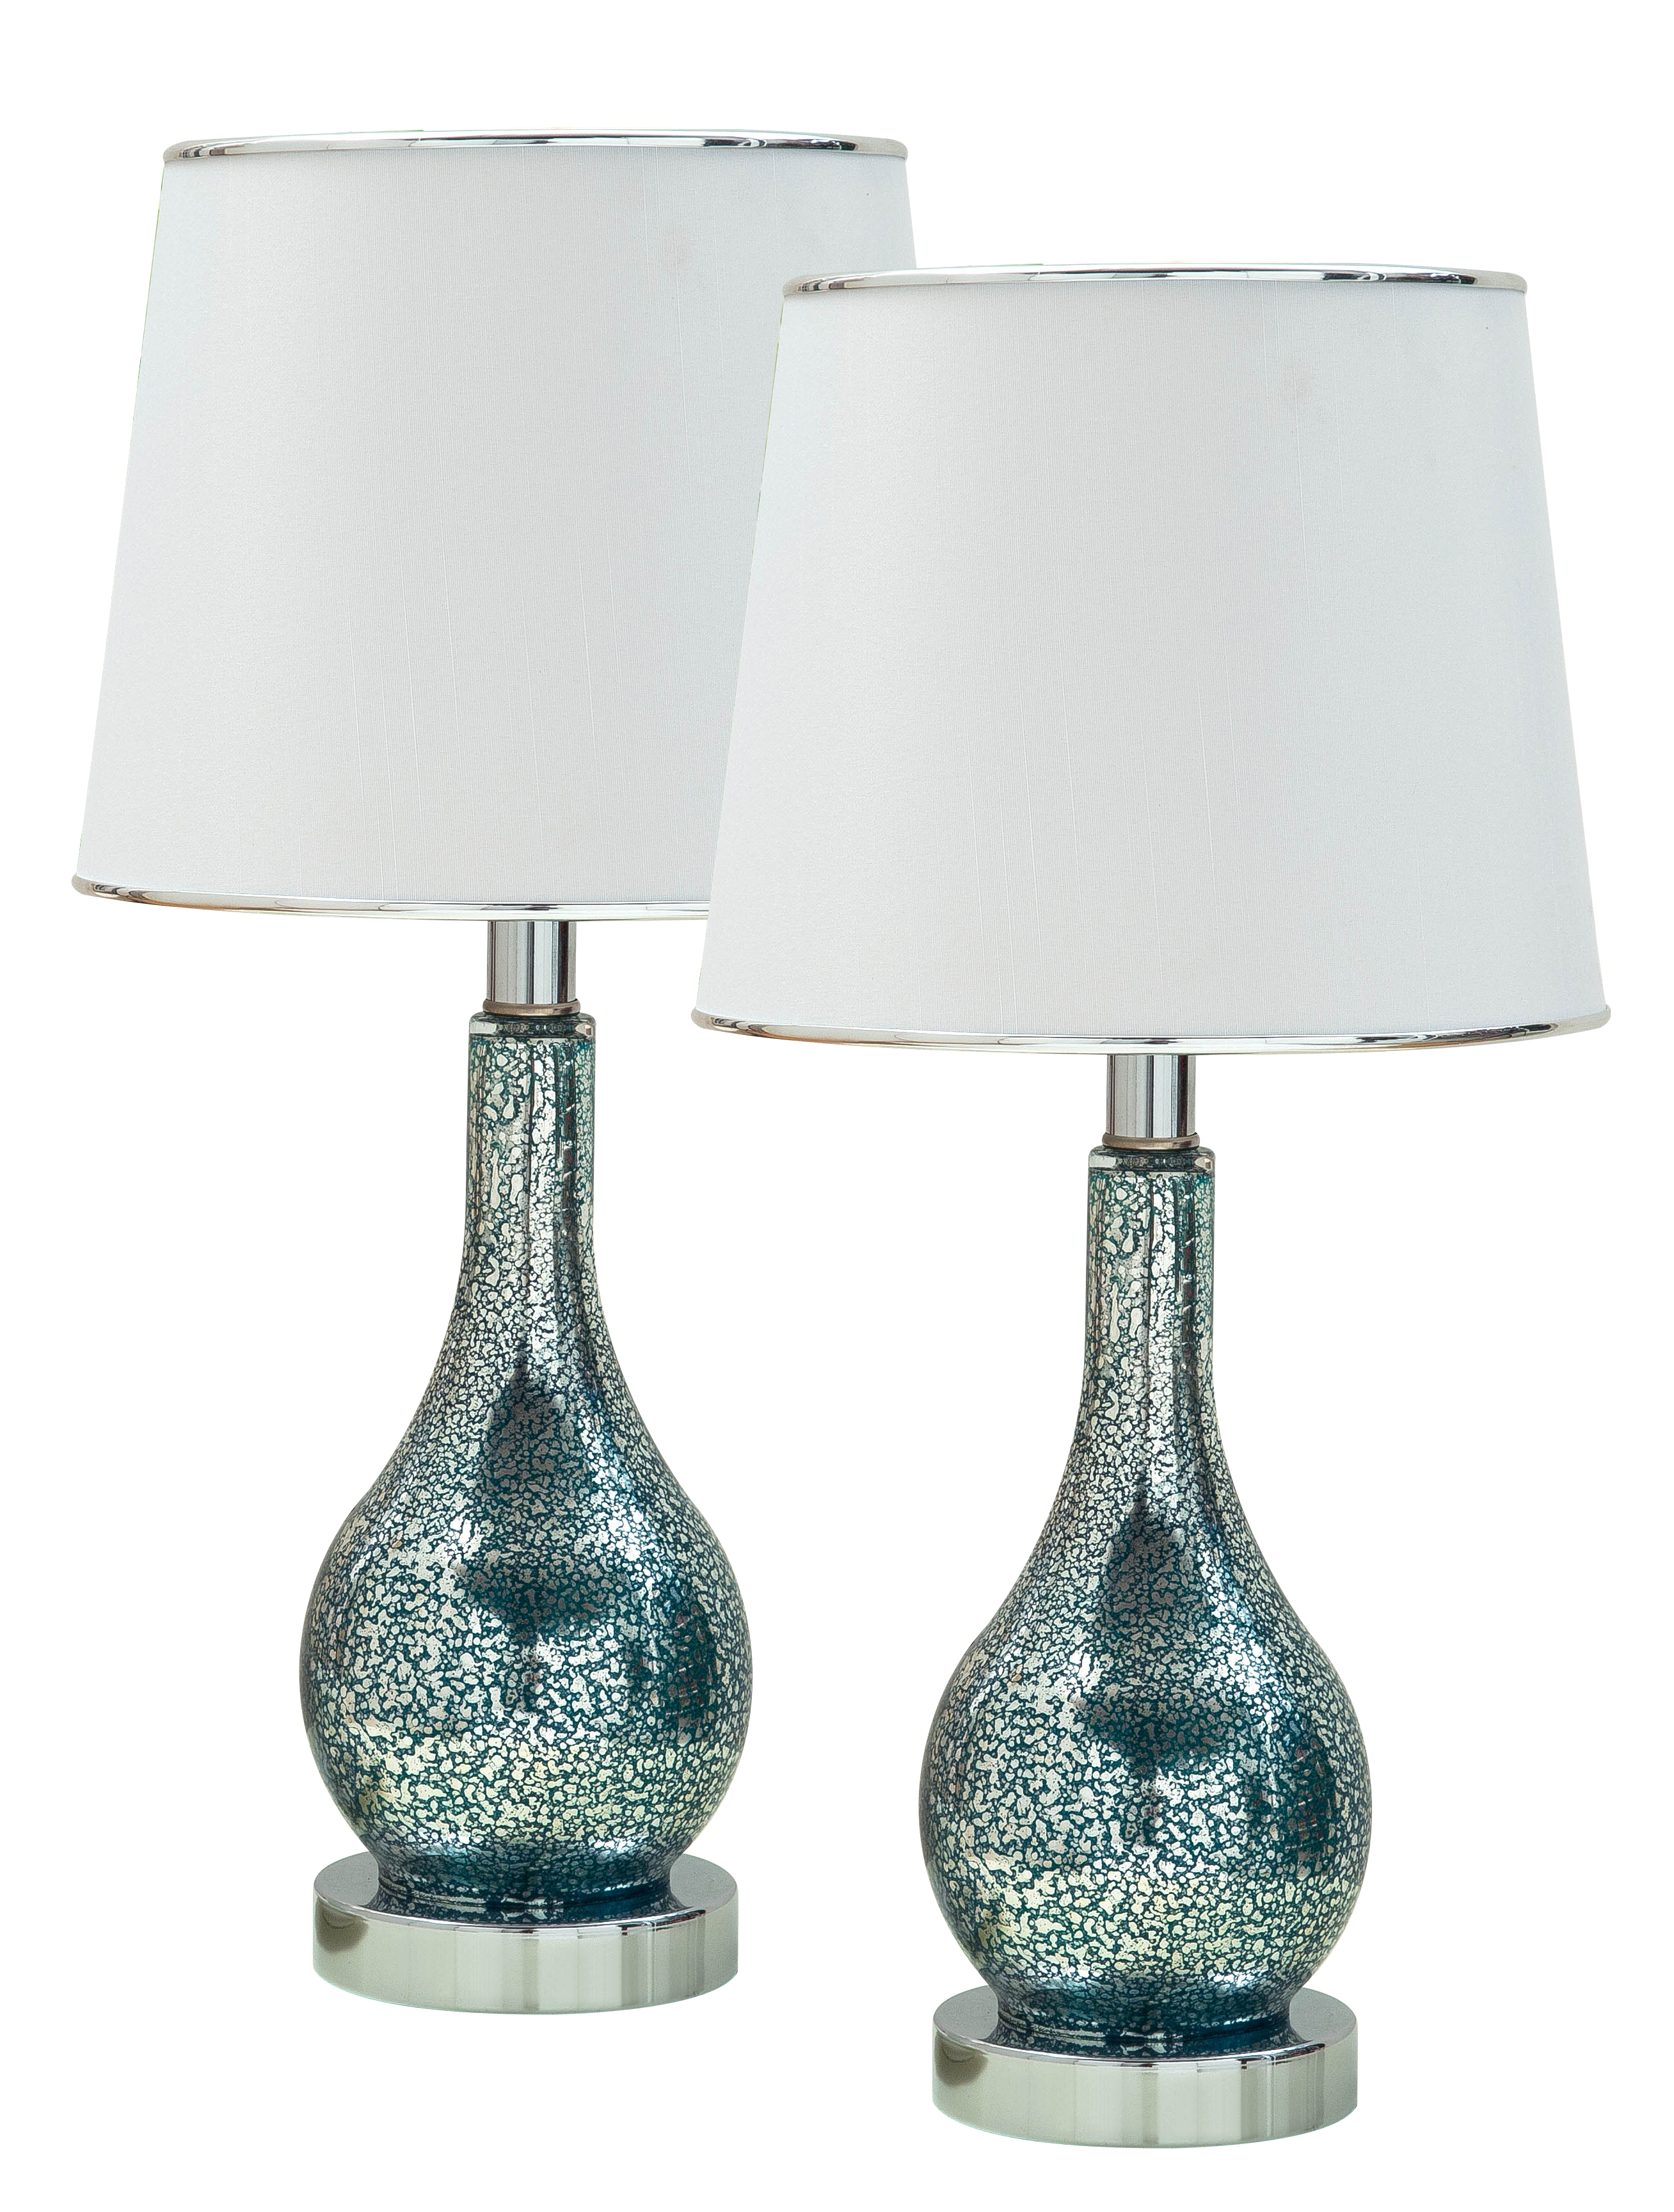 Ardoch Aqua Blue Glass Table Lamp – Set of 2 – 2kfurniture